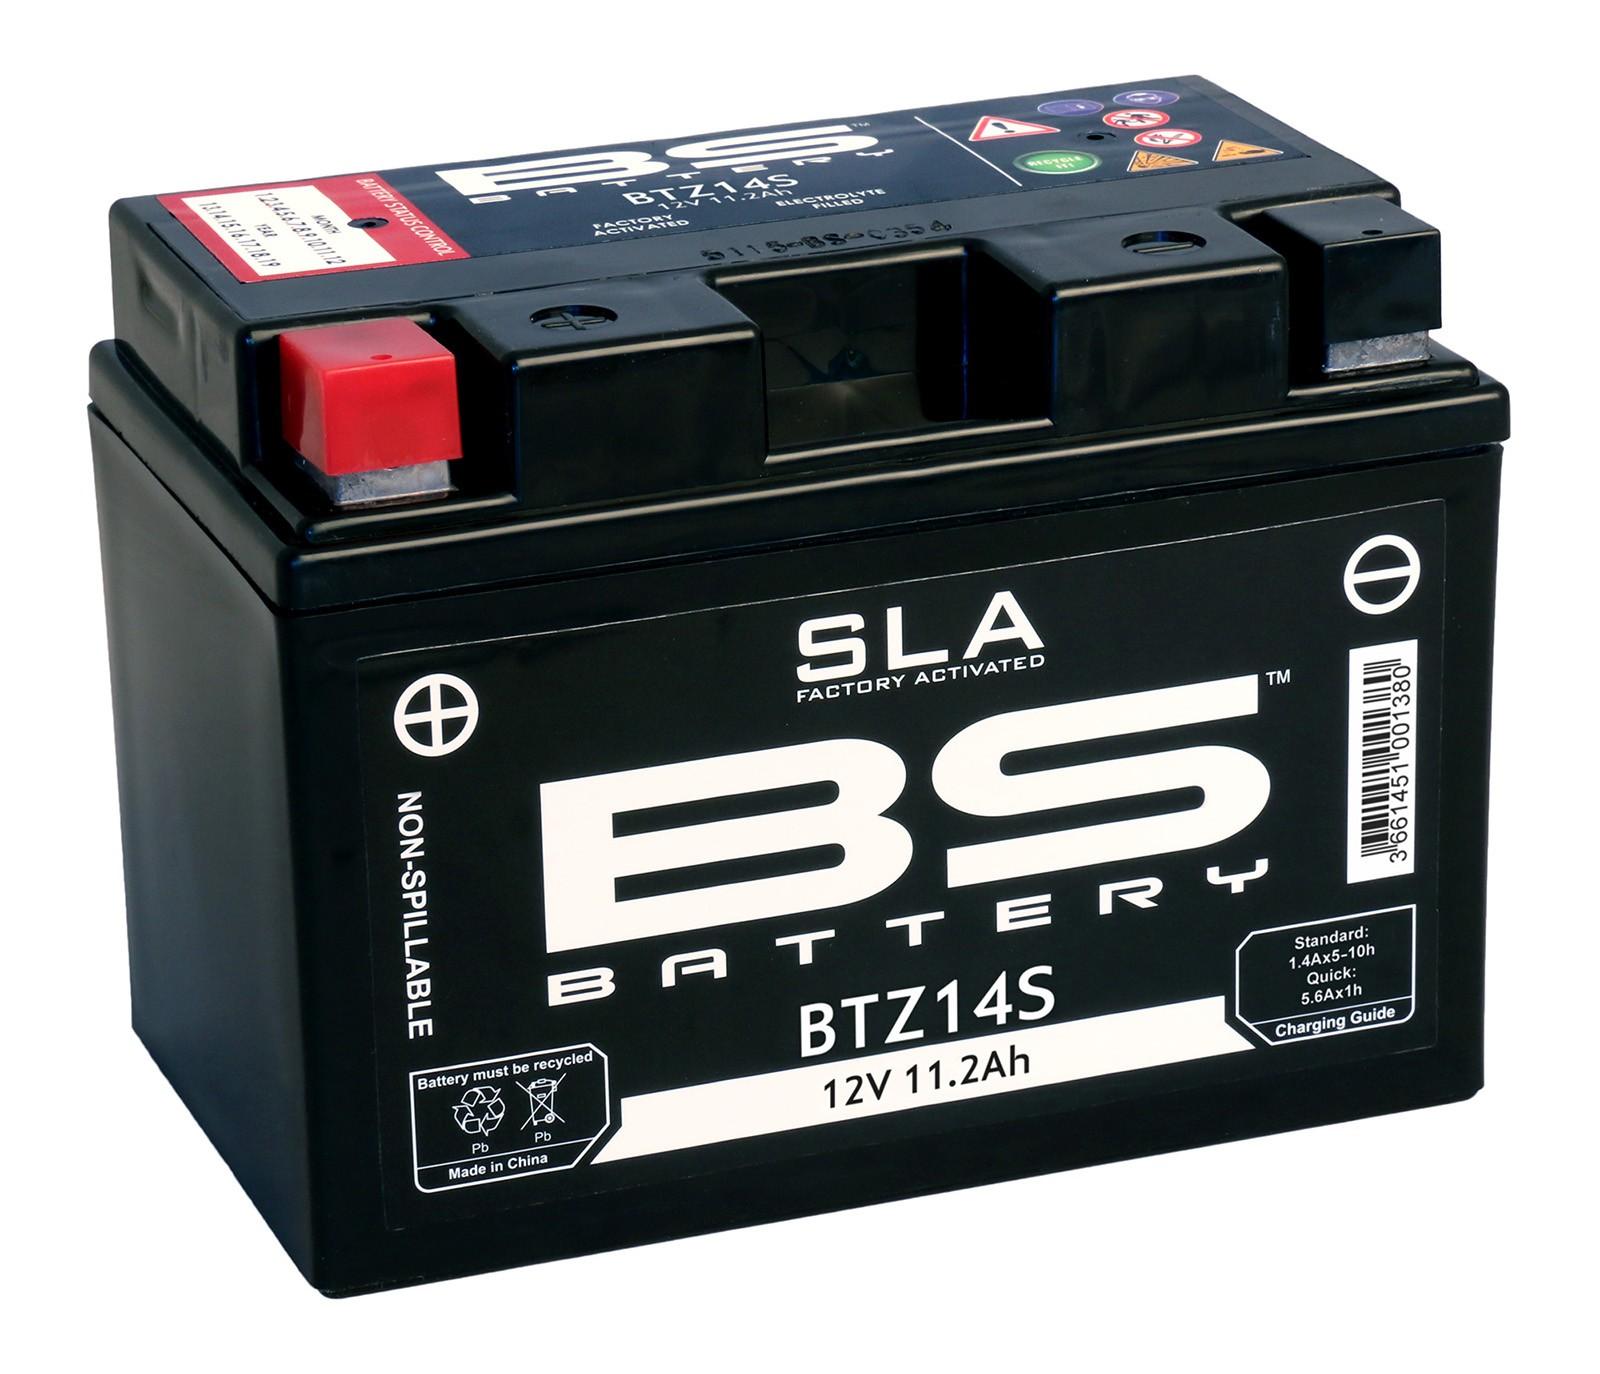 429274-Bateria-BS-KTM-SMT-990-Ano-09-09-BTZ14S-FA